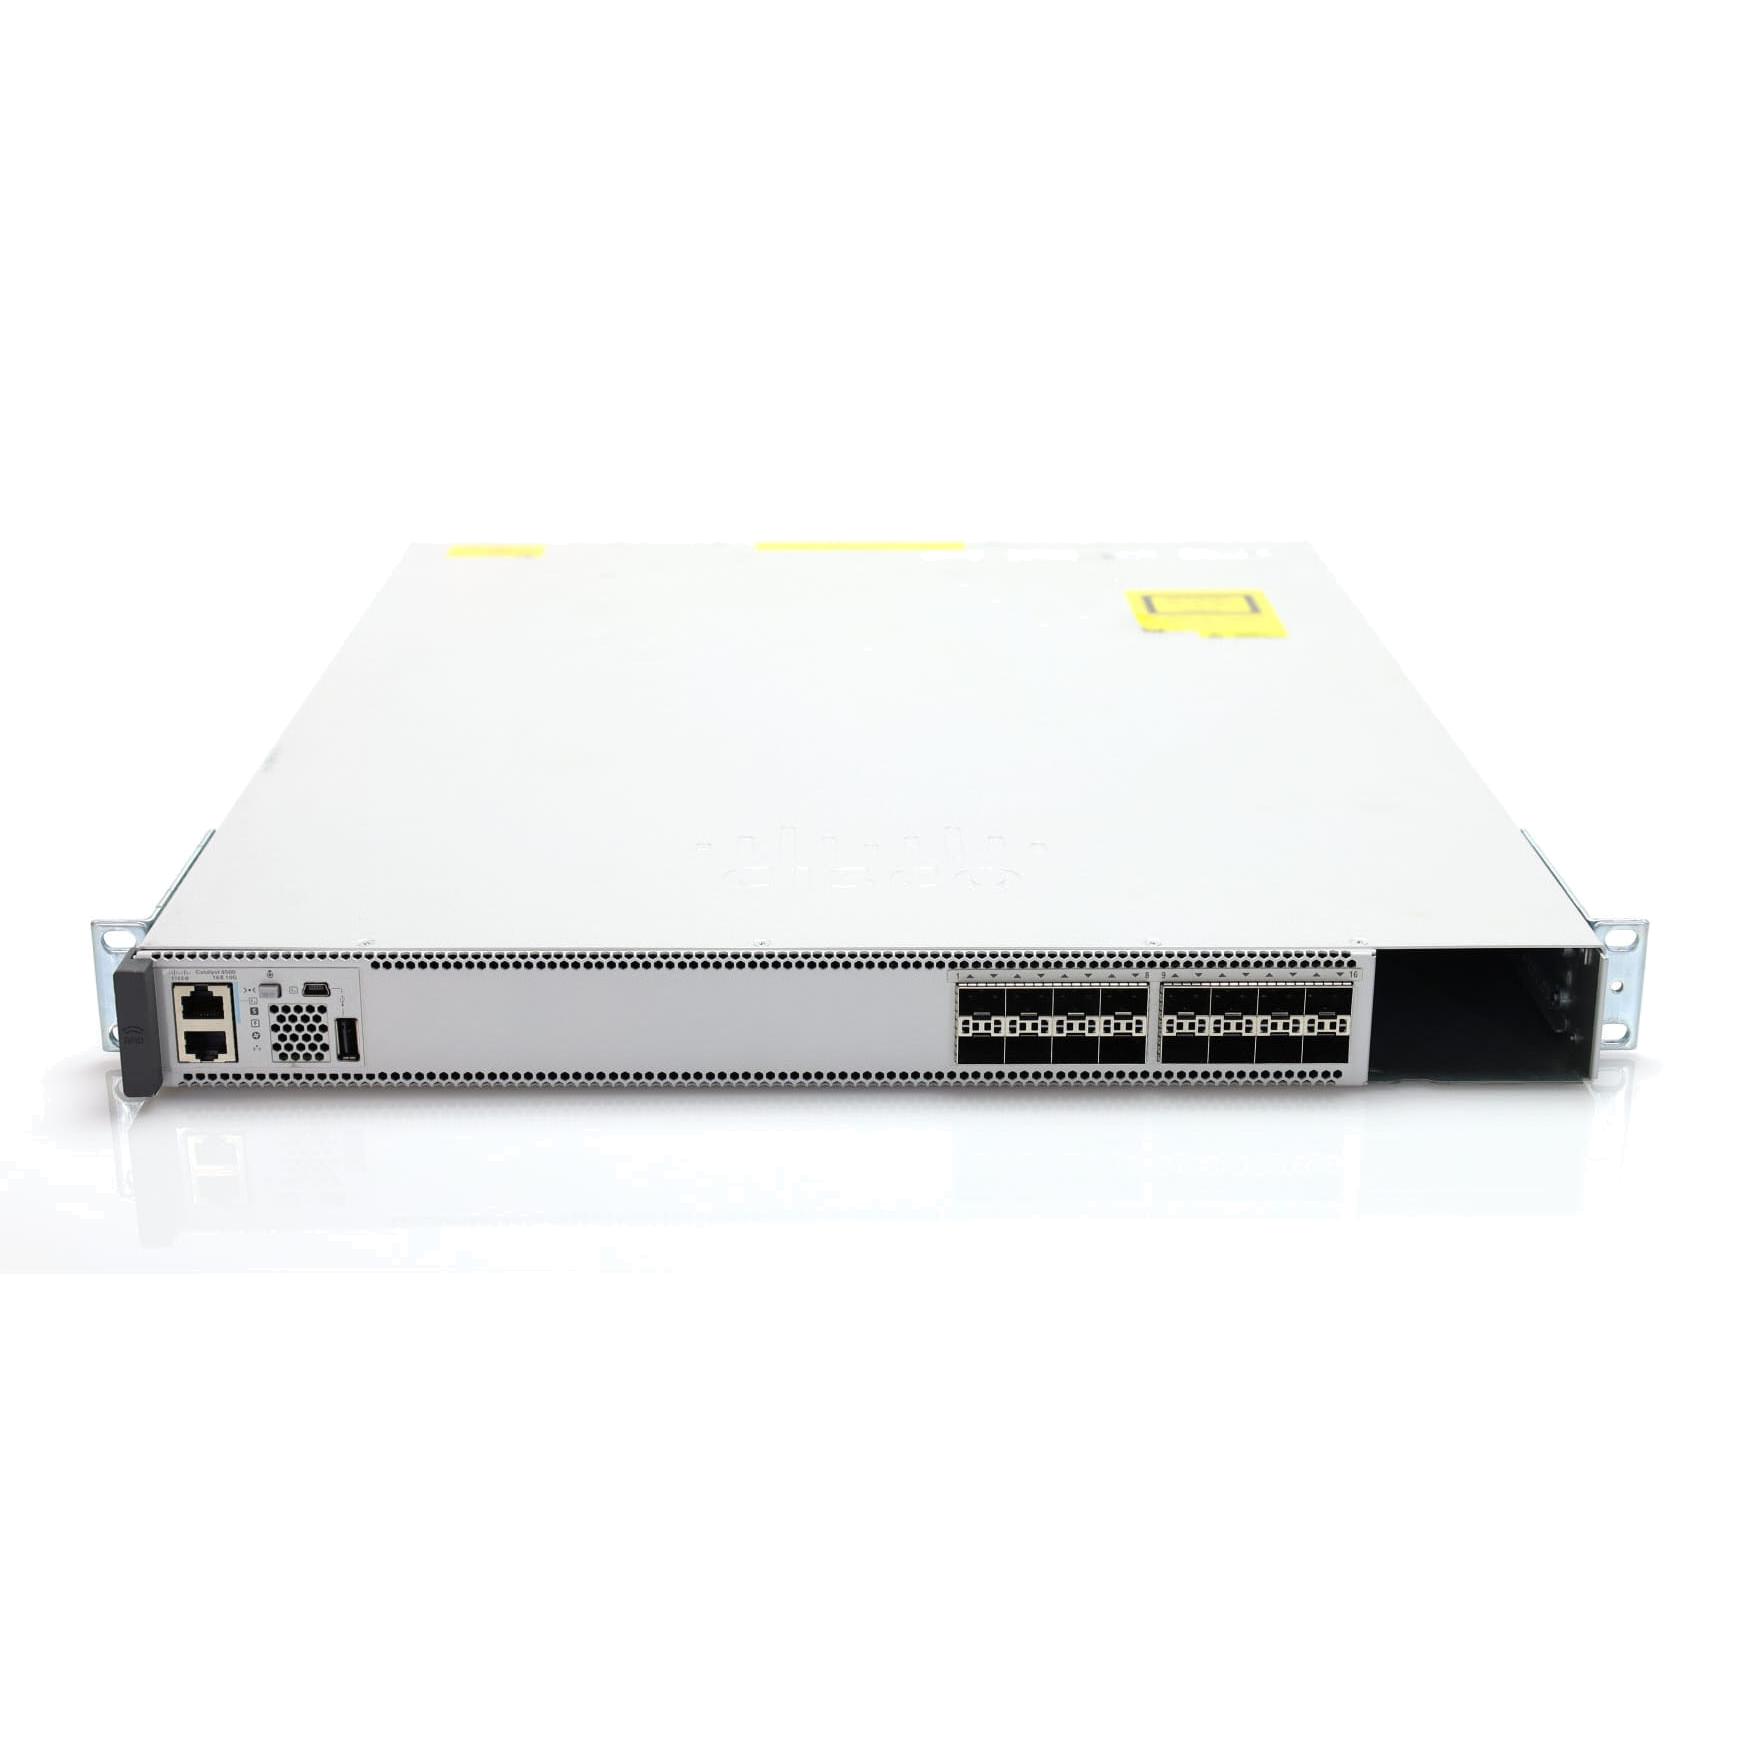 C9500-16X-A